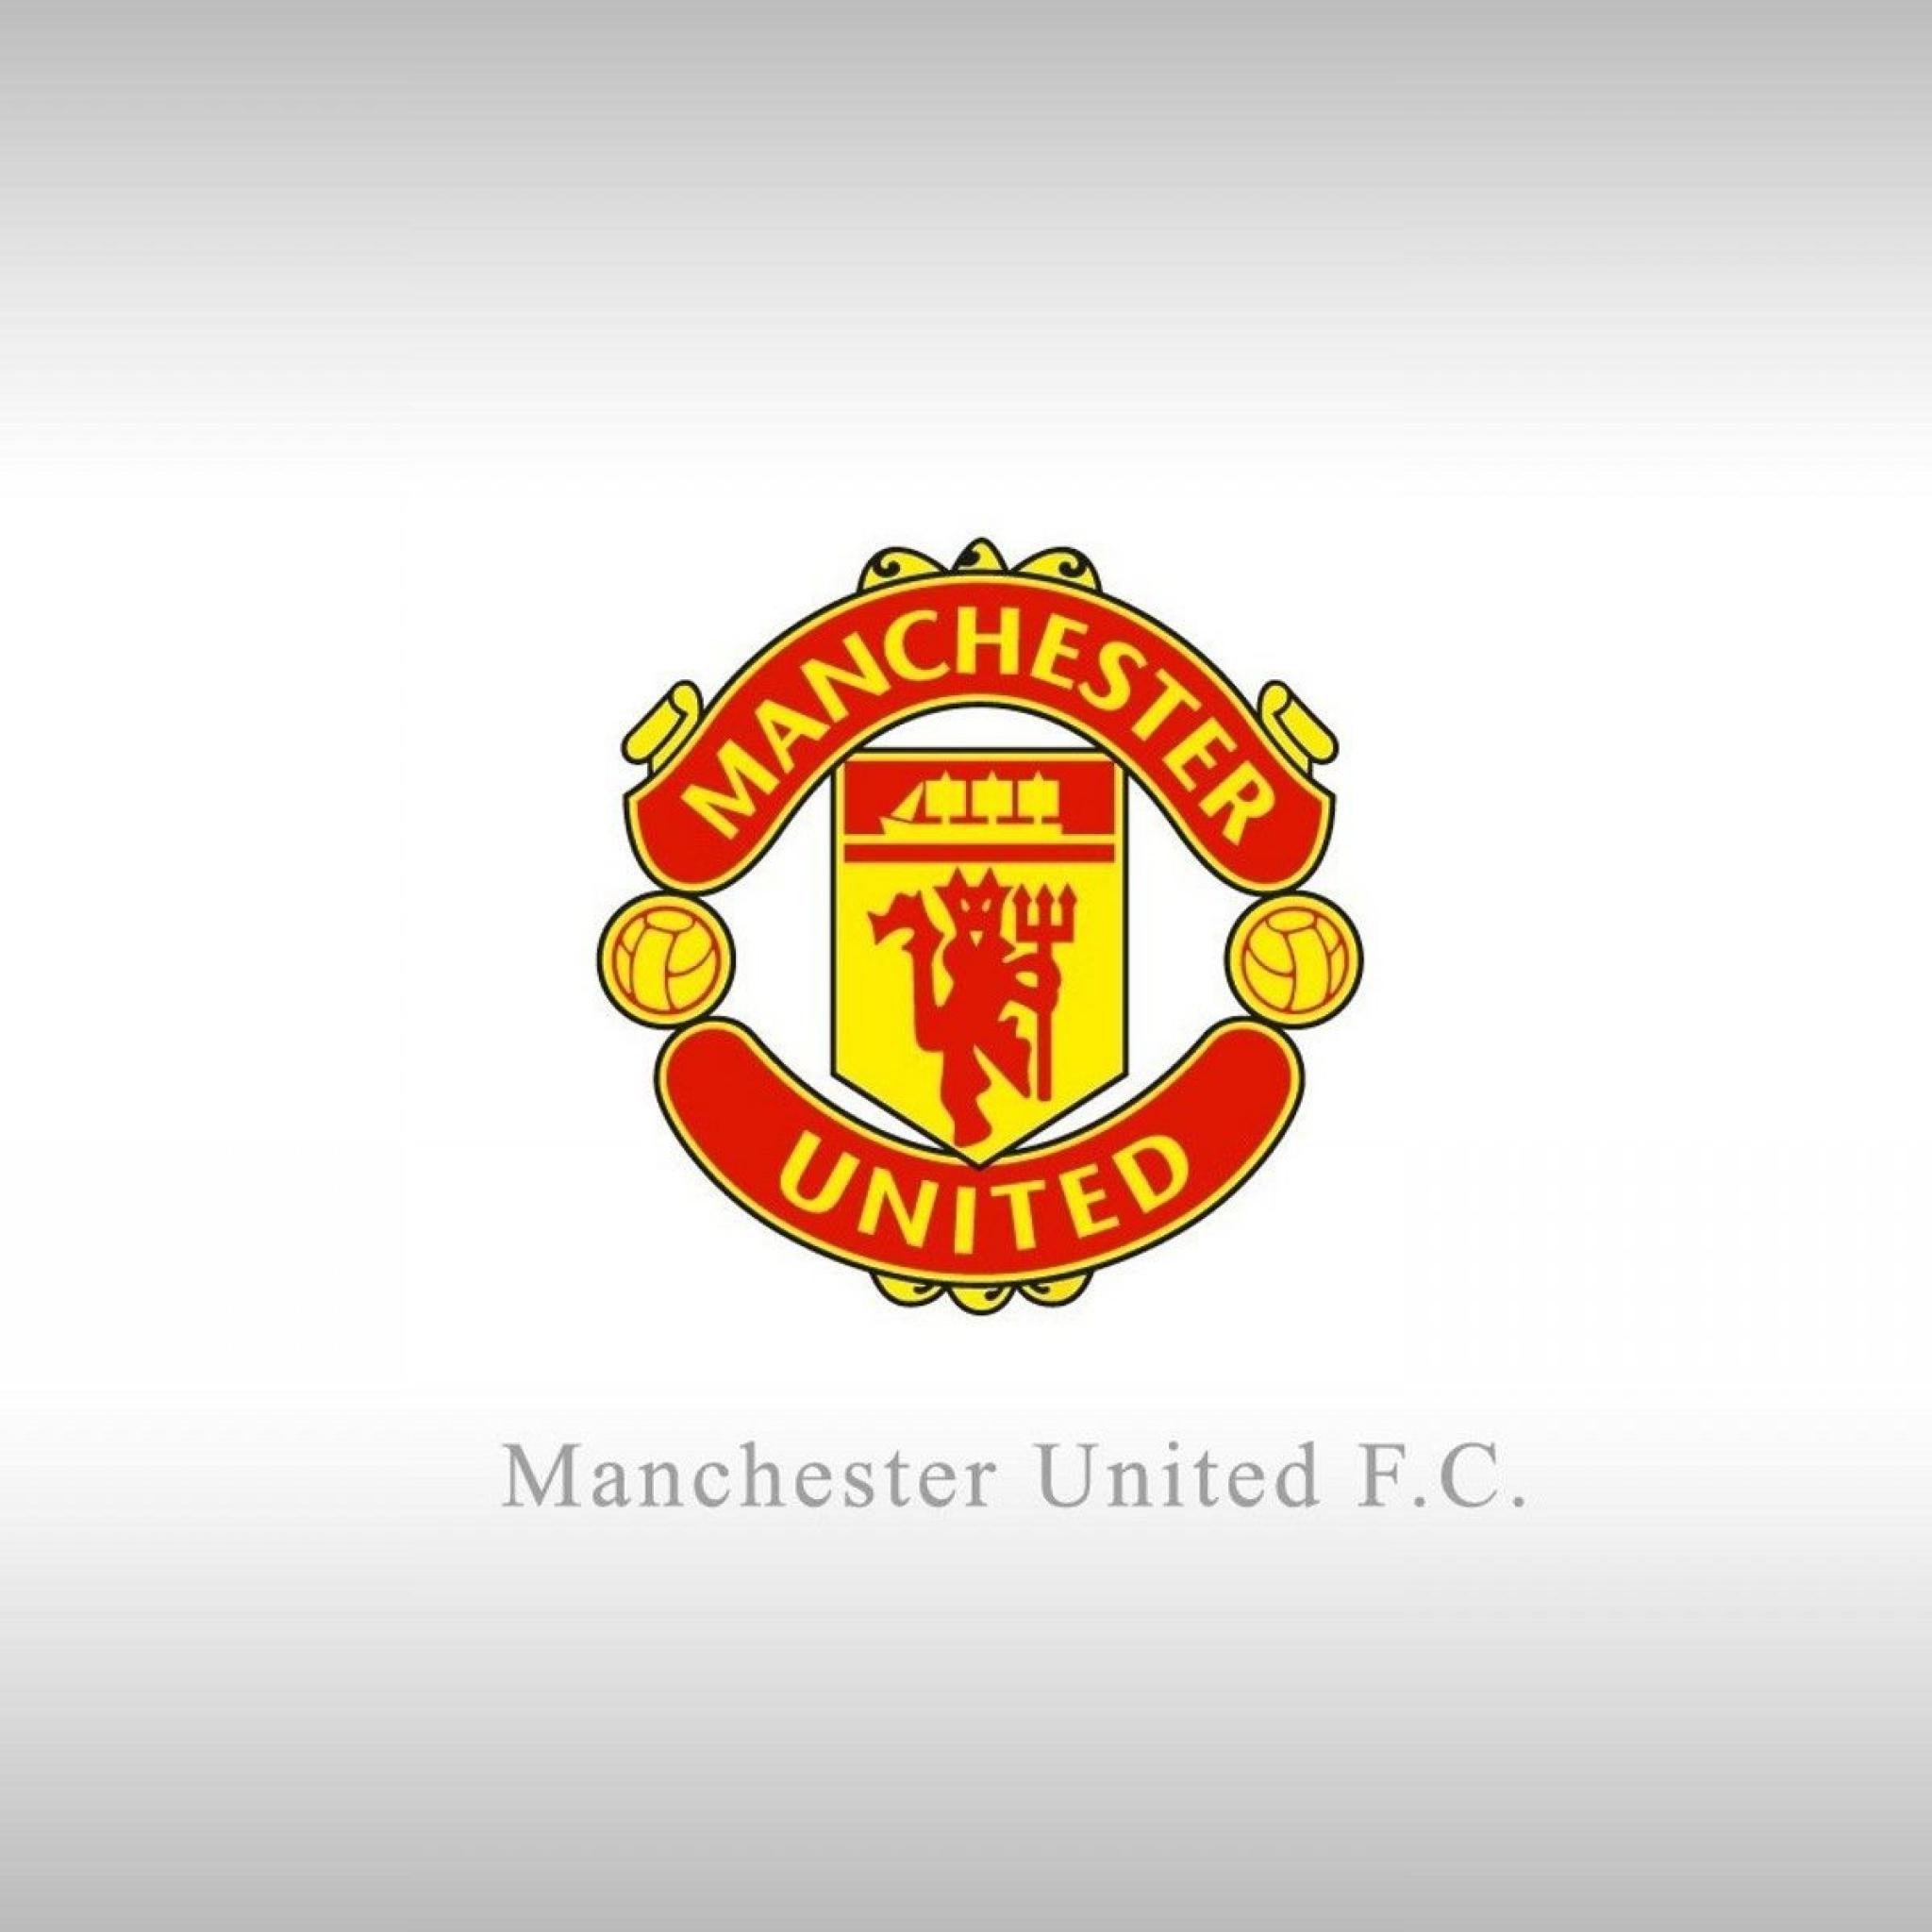 Manchester_united_logo-2